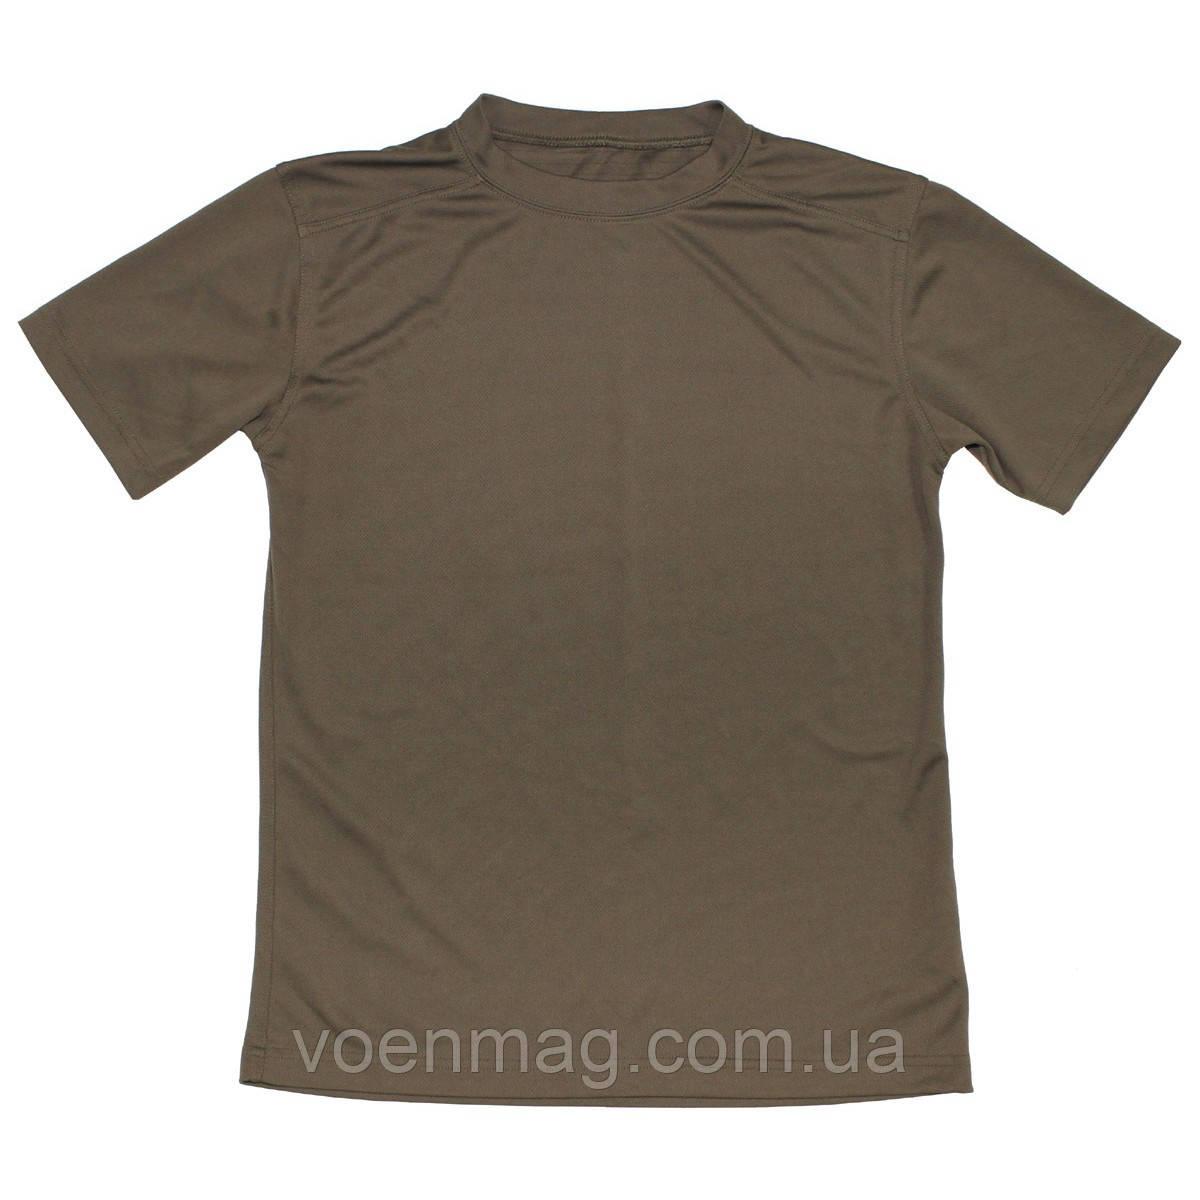 Британские футболки